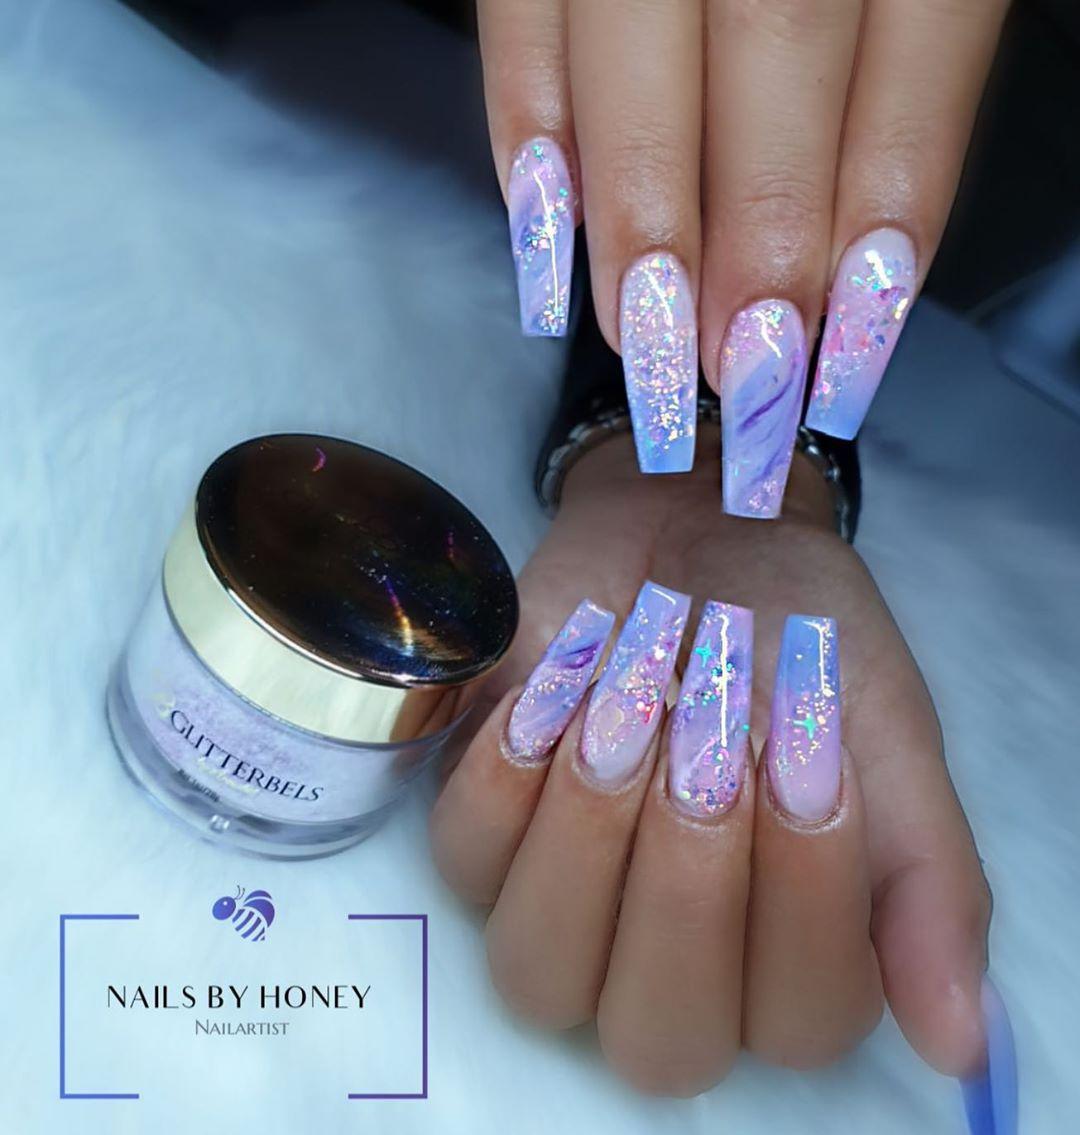 Nails By Honey On Instagram Fairytale Crush Products Used Basics Glitterbels Dehydrator Glit